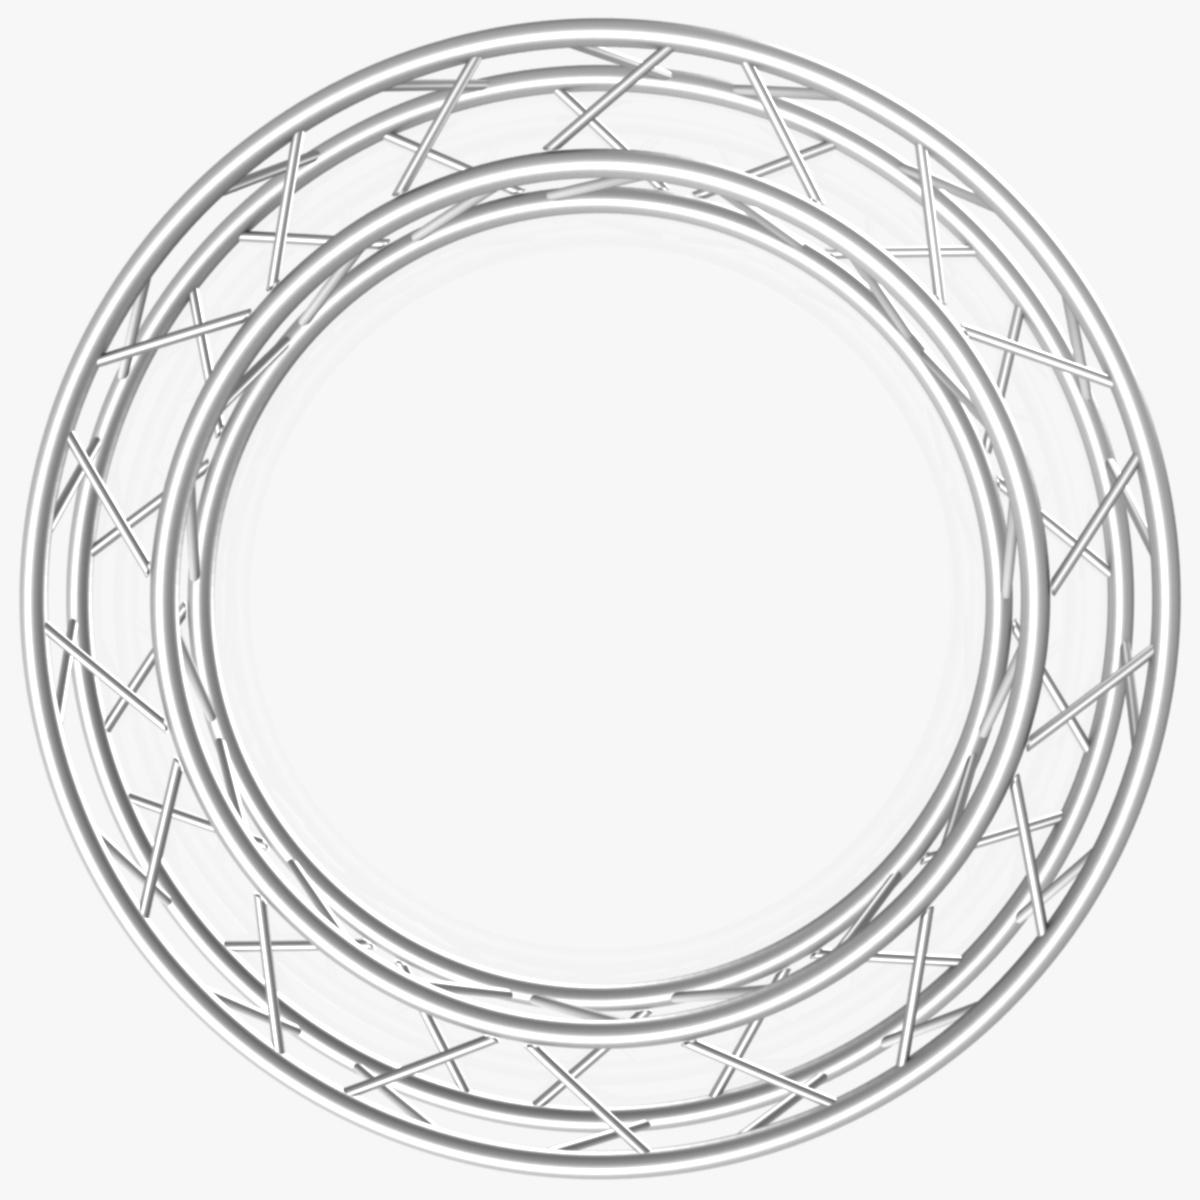 дугуй дөрвөлжин Дотоод (бүрэн диаметр 200cm) 3d загвар 3ds max dxf fbx c4d dae obj 252359